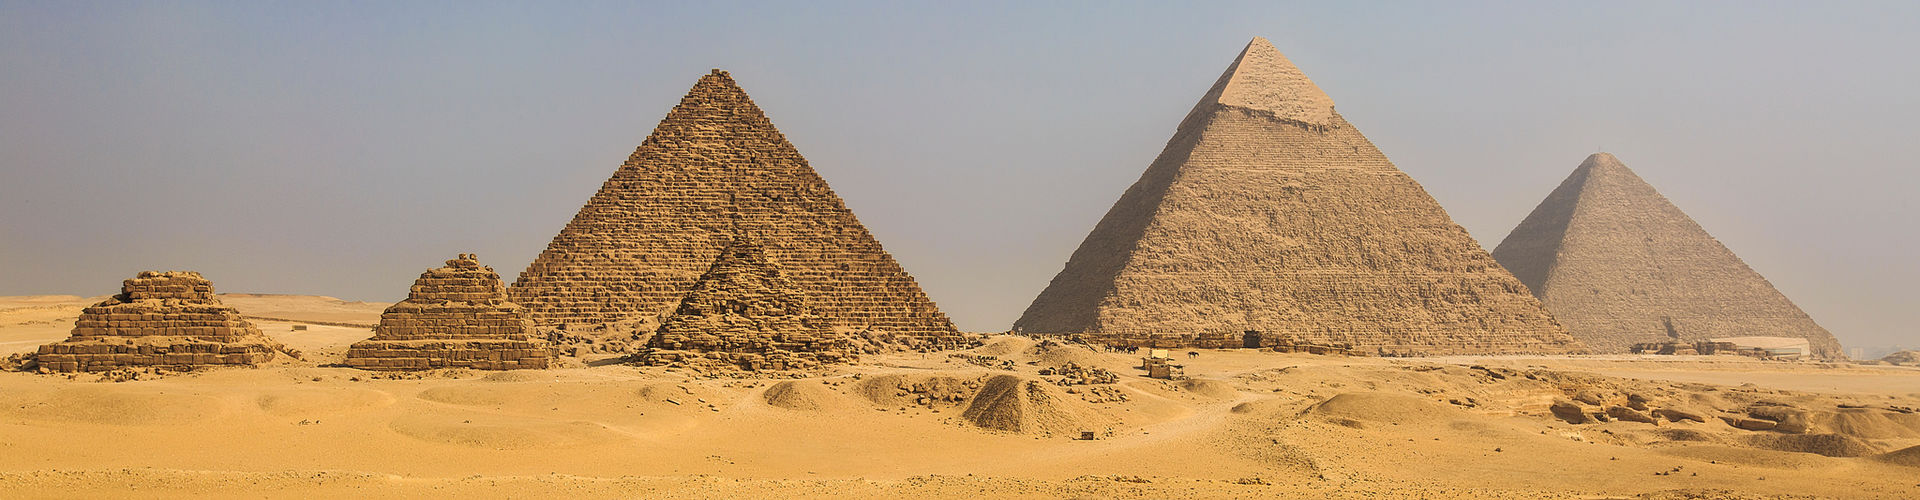 Pyramids Day Tours, giza pyramids, pyramids of Giza